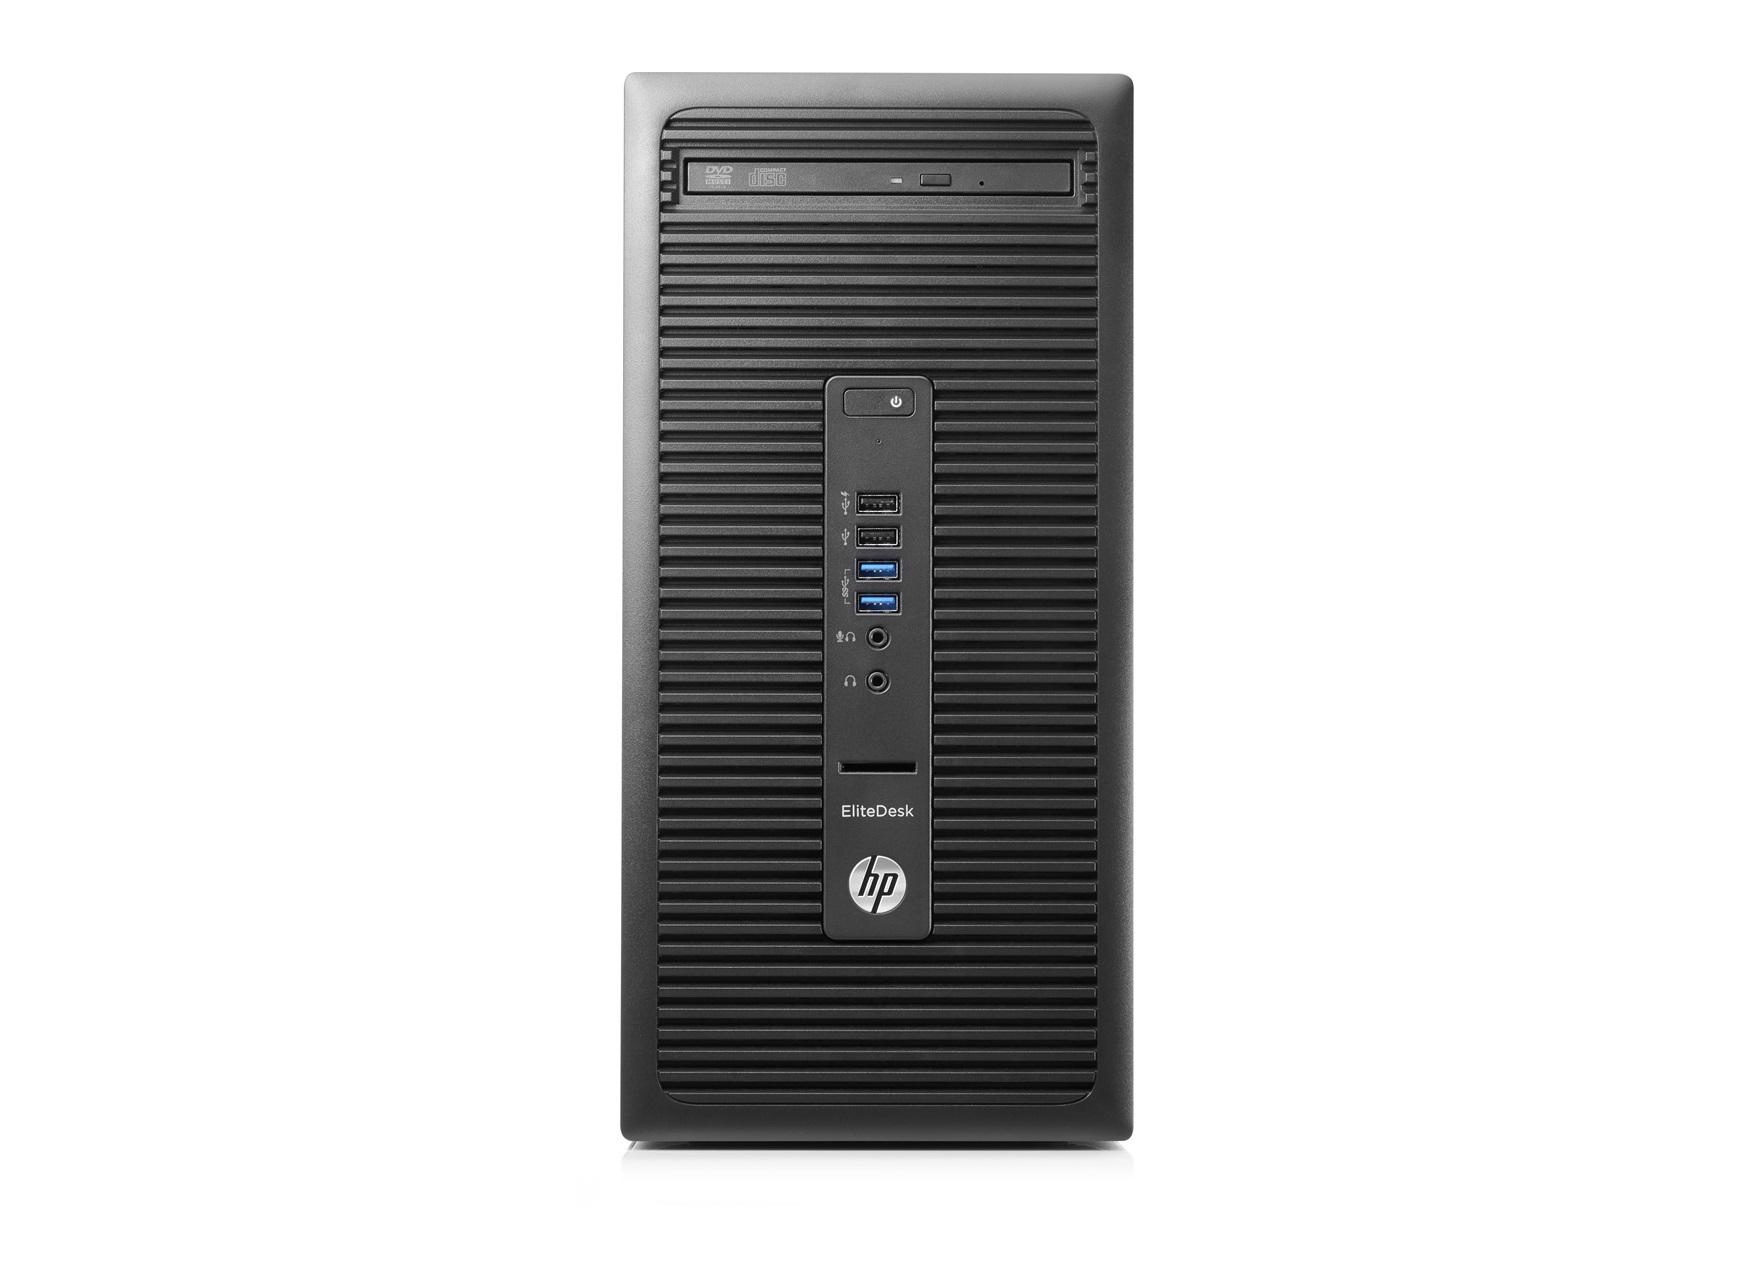 HP EliteDesk 705 G2 3.6GHz A10 PRO-8750B